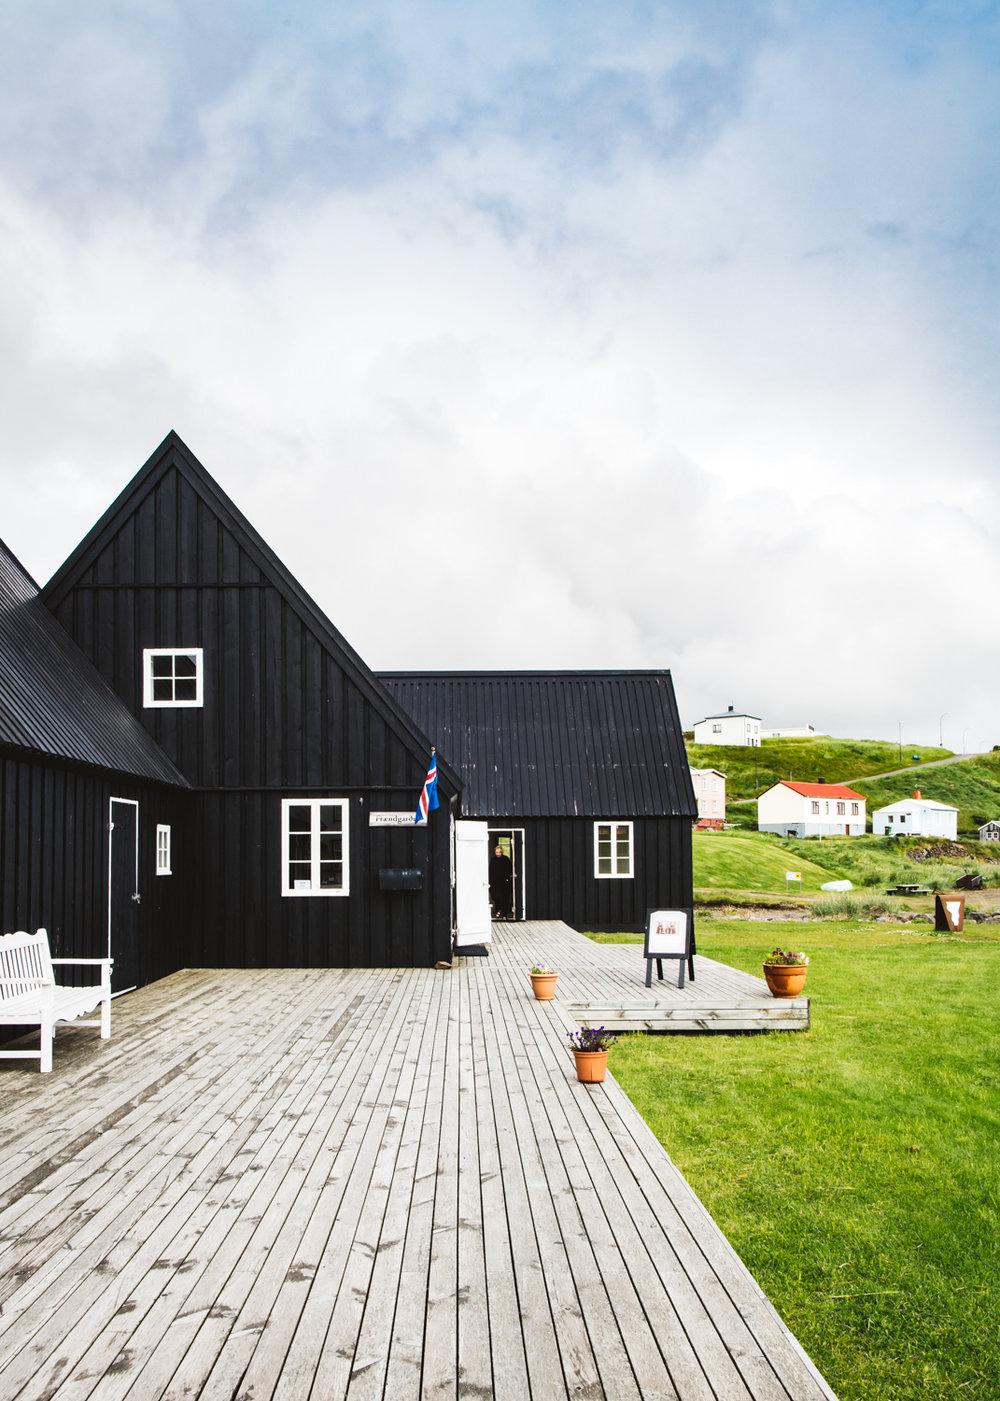 North-Iceland_7_c Nanna Dis 2018 (1 of 1)-2.jpg